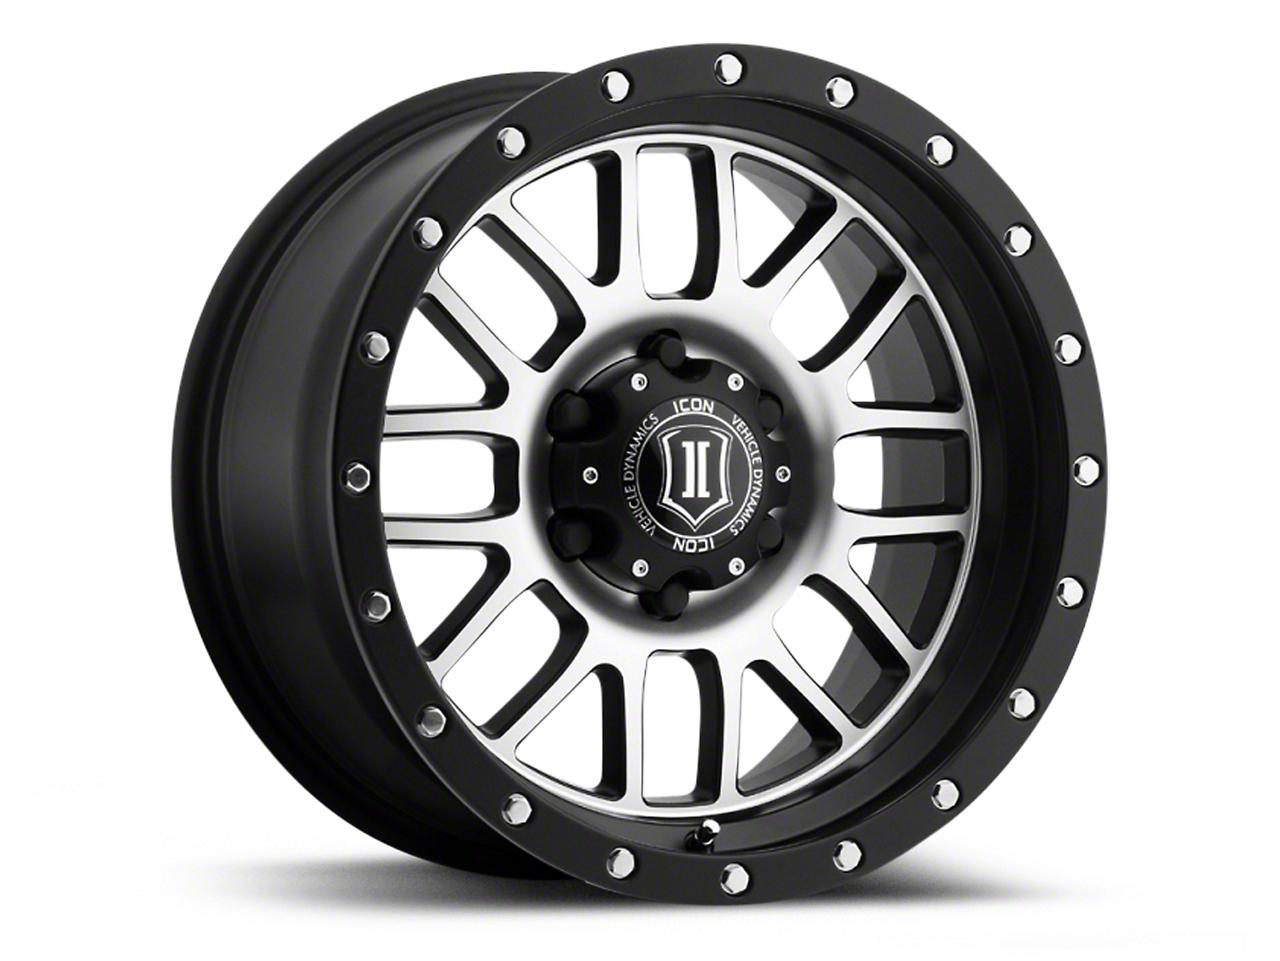 ICON Vehicle Dynamics Alpha Satin Black Machined Wheel - 17x8.5 (07-18 Jeep Wrangler JK; 2018 Jeep Wrangler JL)